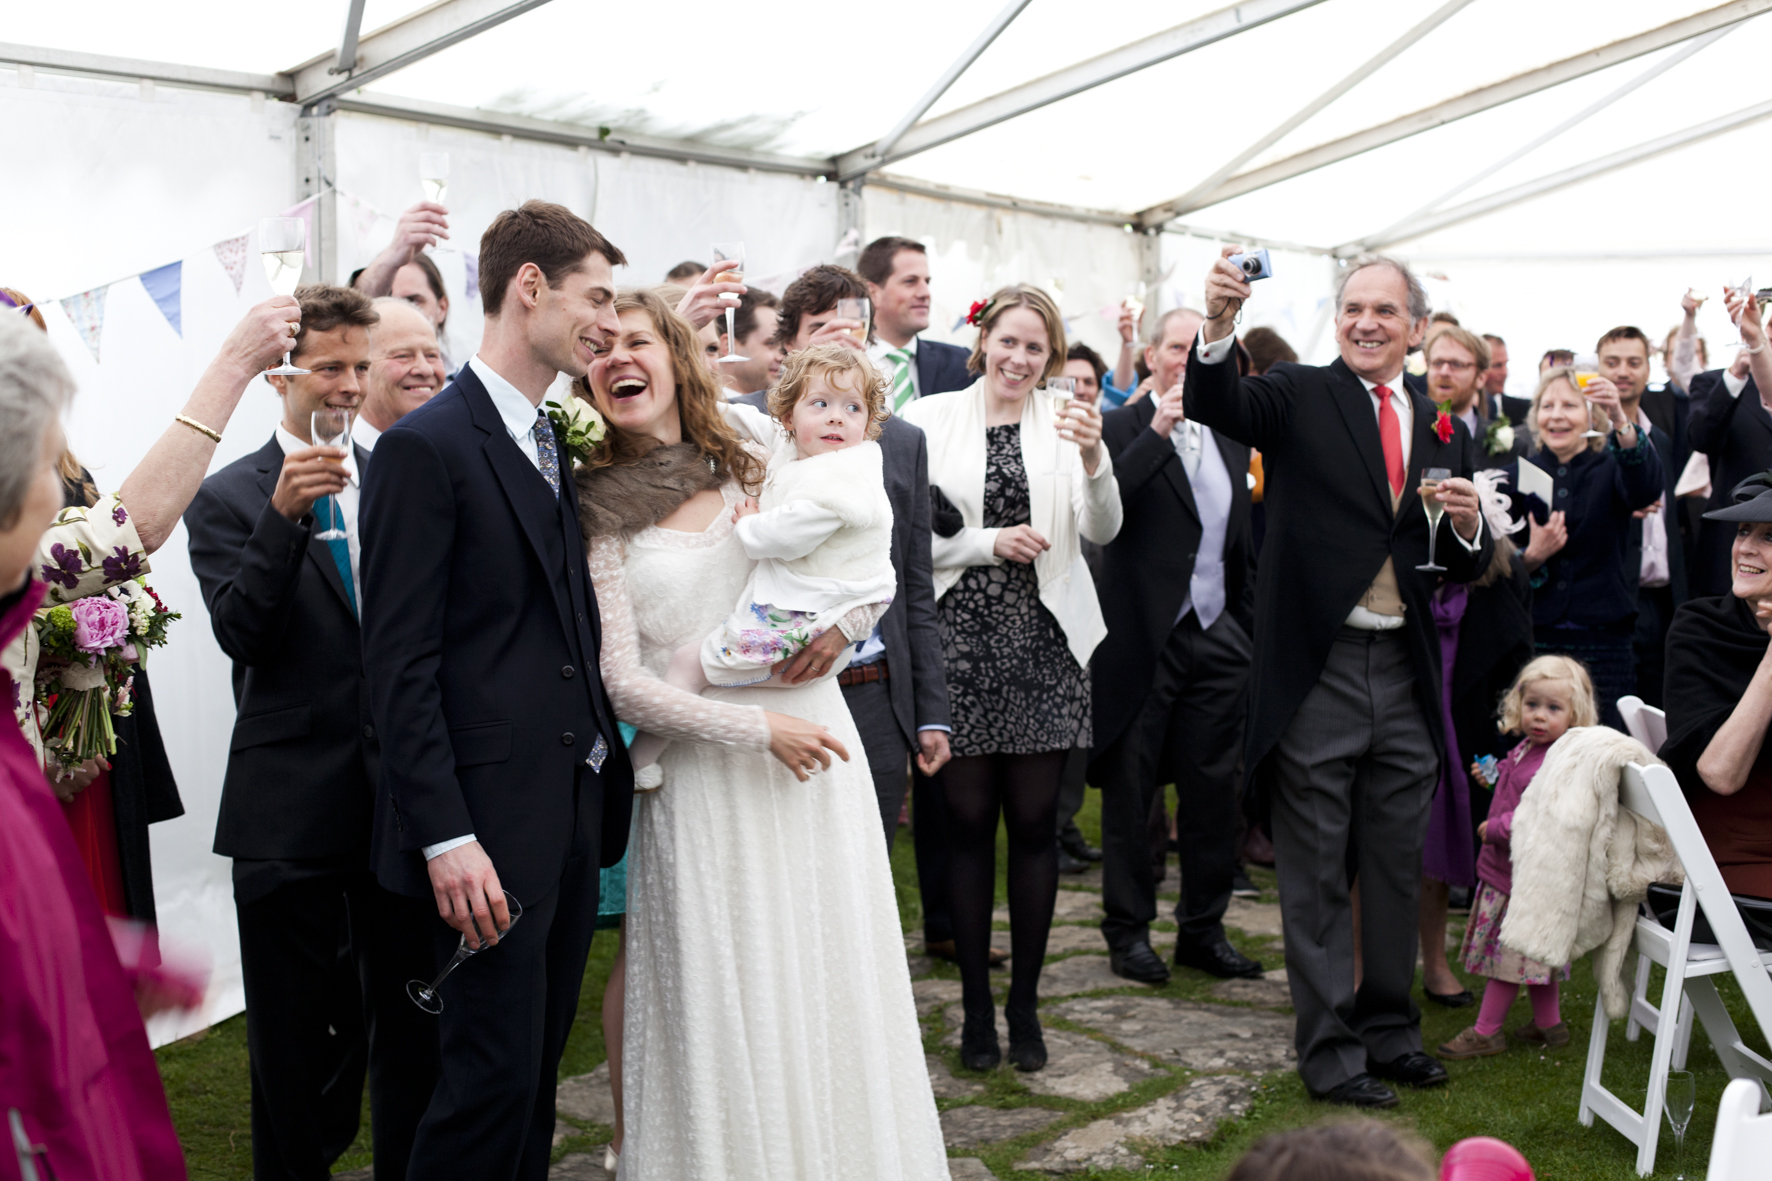 Wedding example_M&P__MG_3832_Claudia Leisinger.jpg